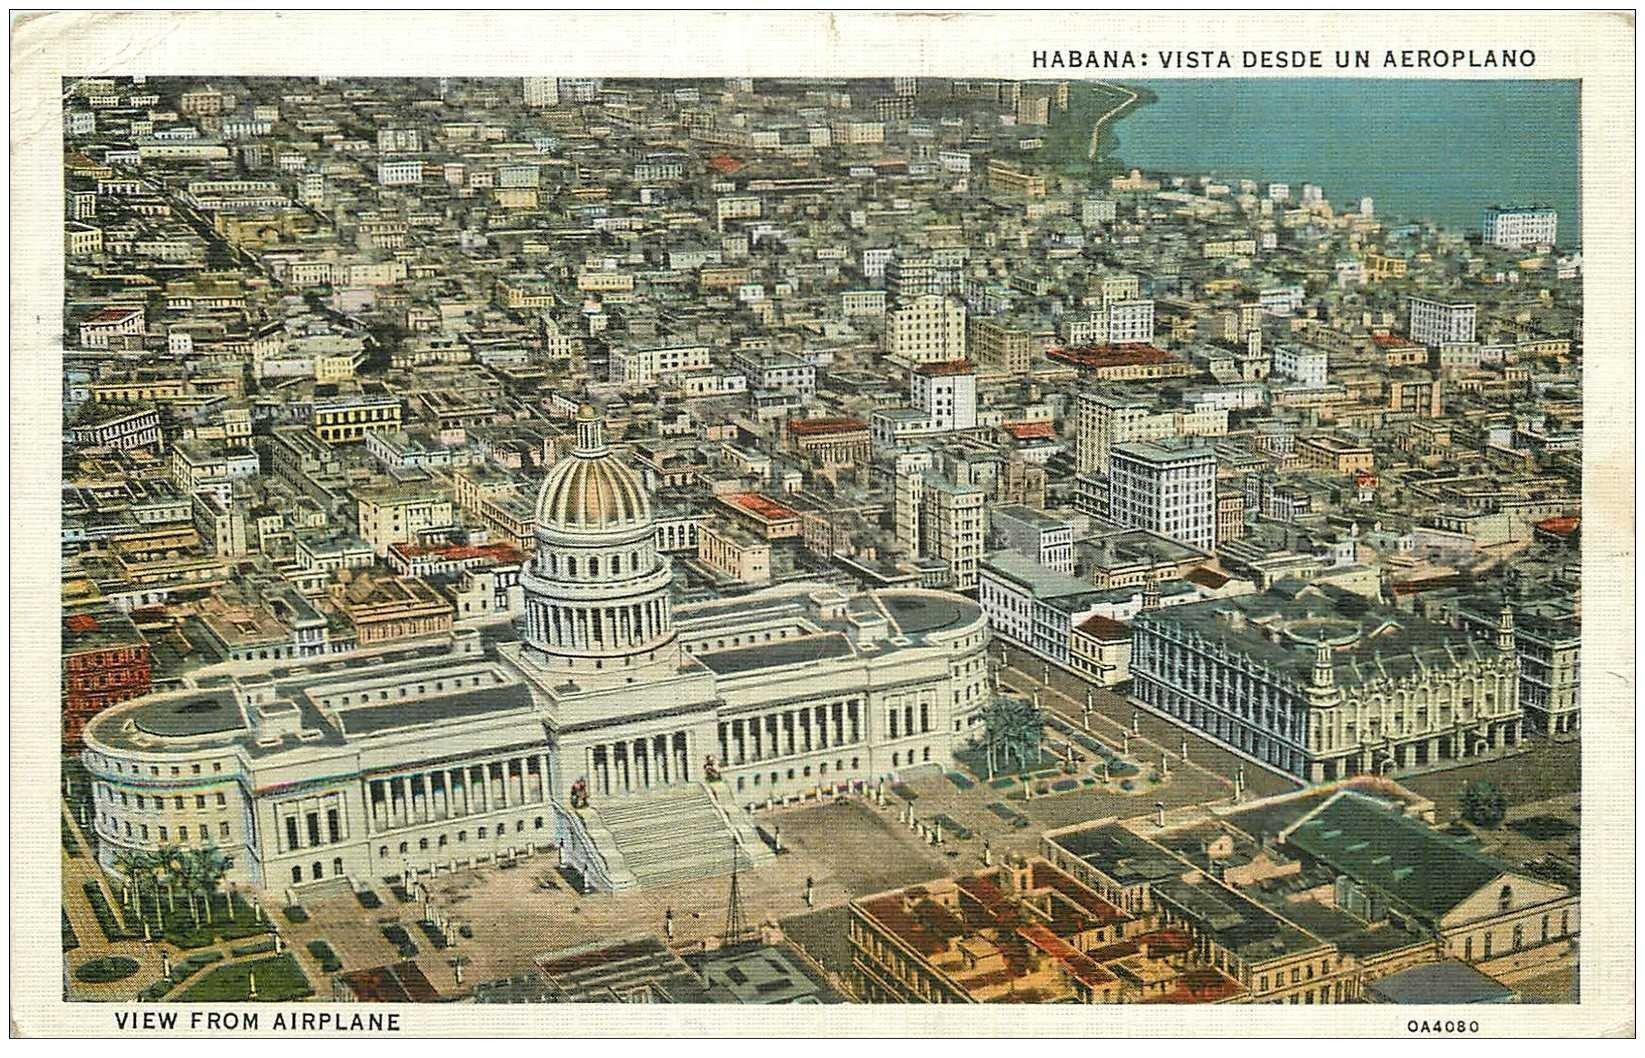 carte postale ancienne CUBA. Habana vista desde un Aeroplano. View from Airplane 1937